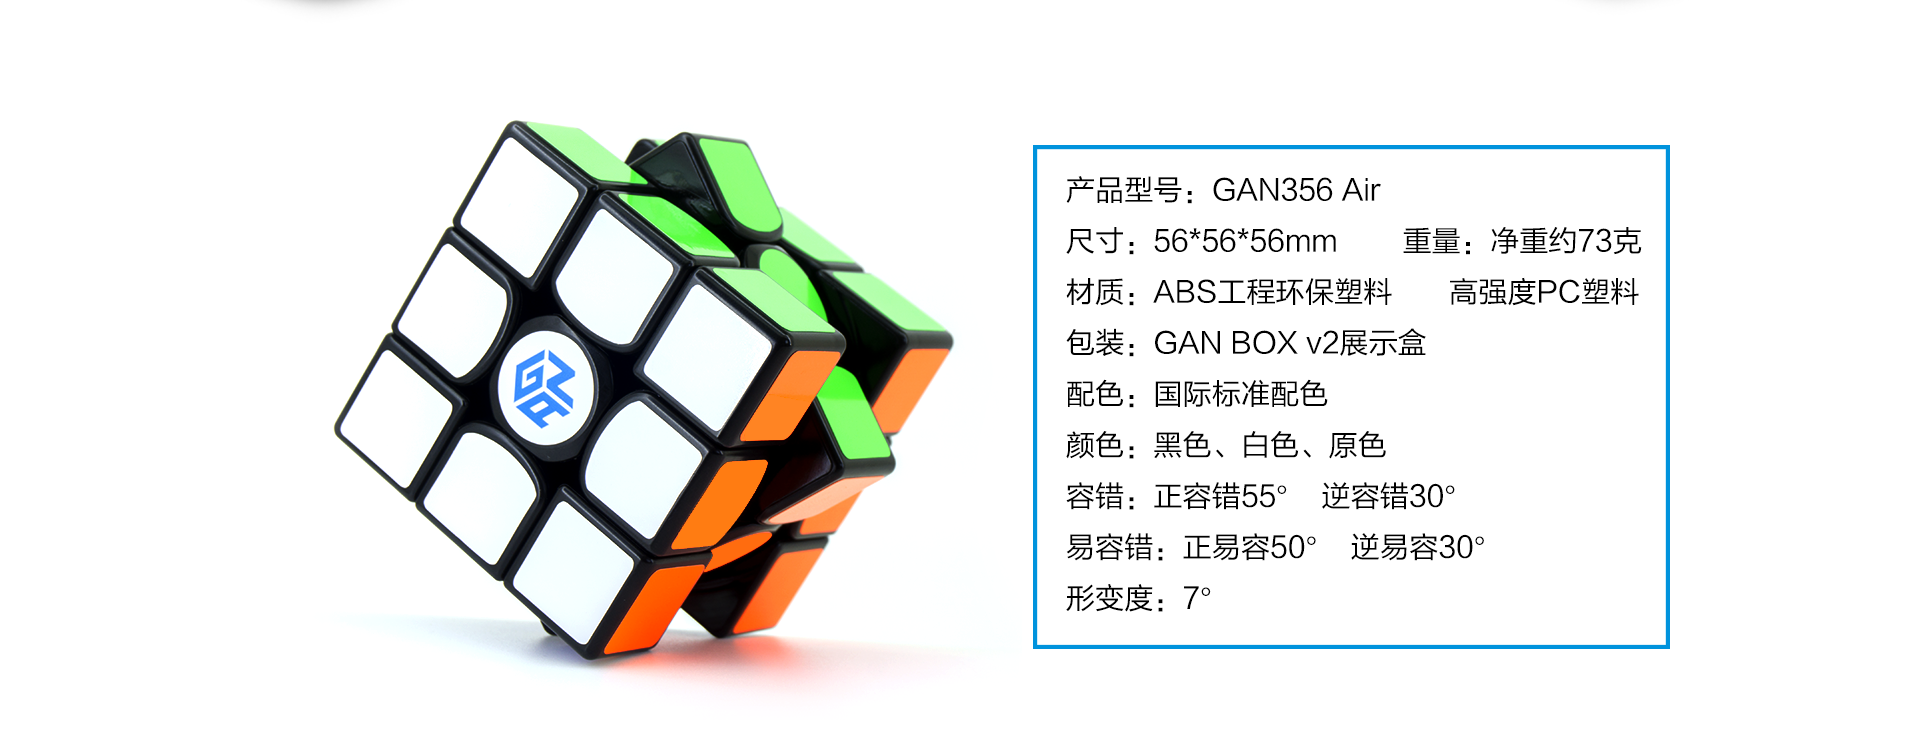 GAN356-Air-图文详情二_10